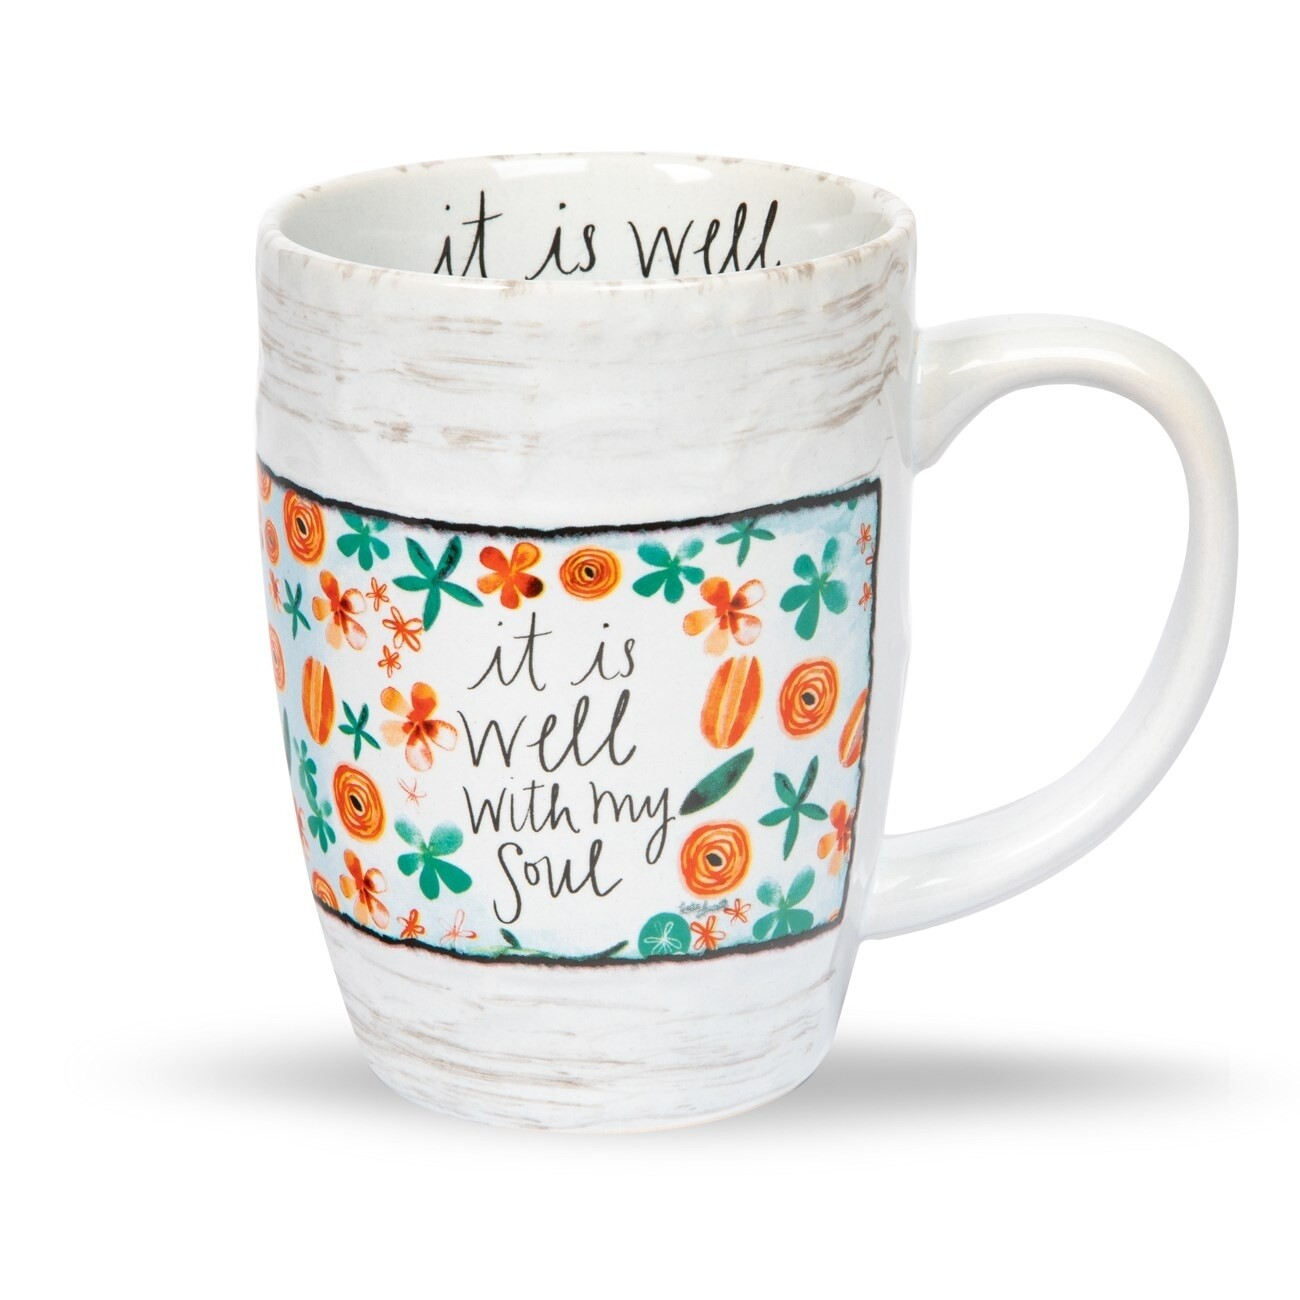 Brownlow Floral Mug - It Is Well